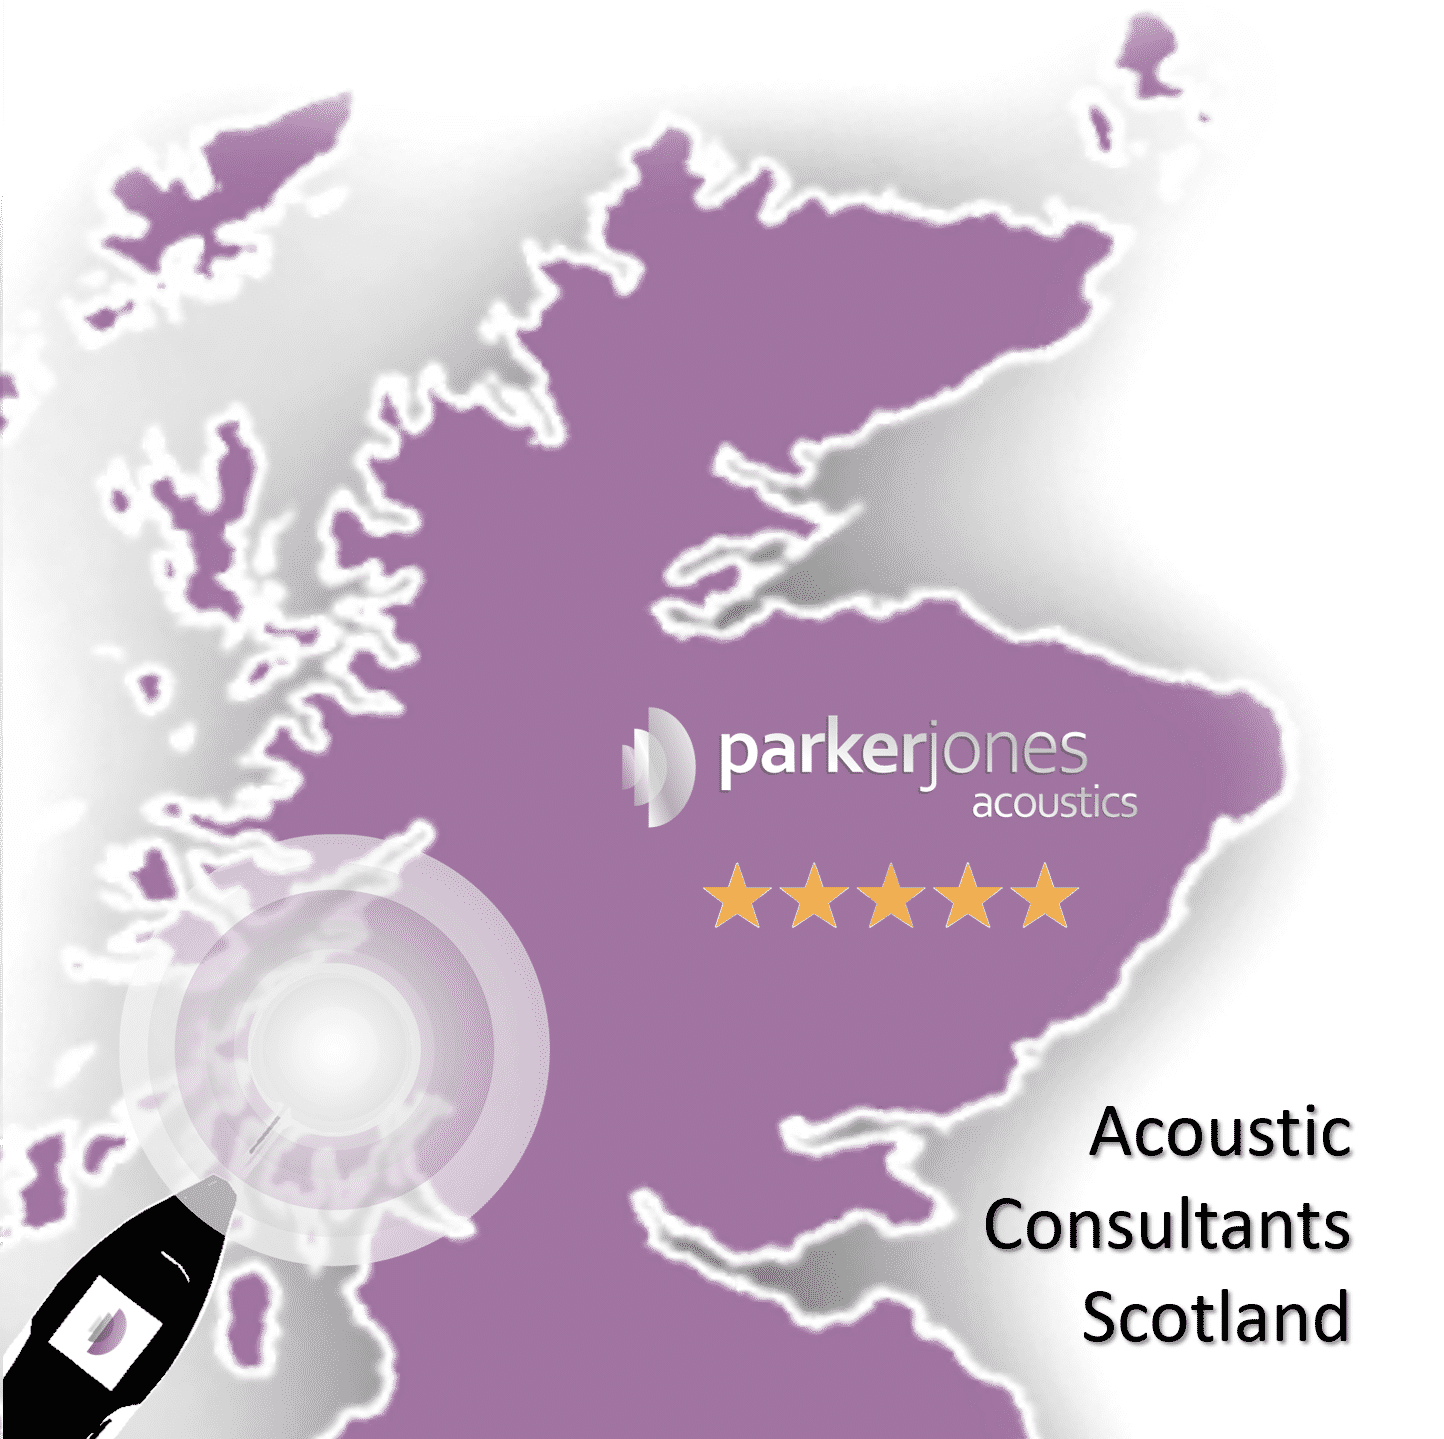 Acoustic Consultants in Scotland Glasgow Edinburgh Aberdeen Dundee Inverness